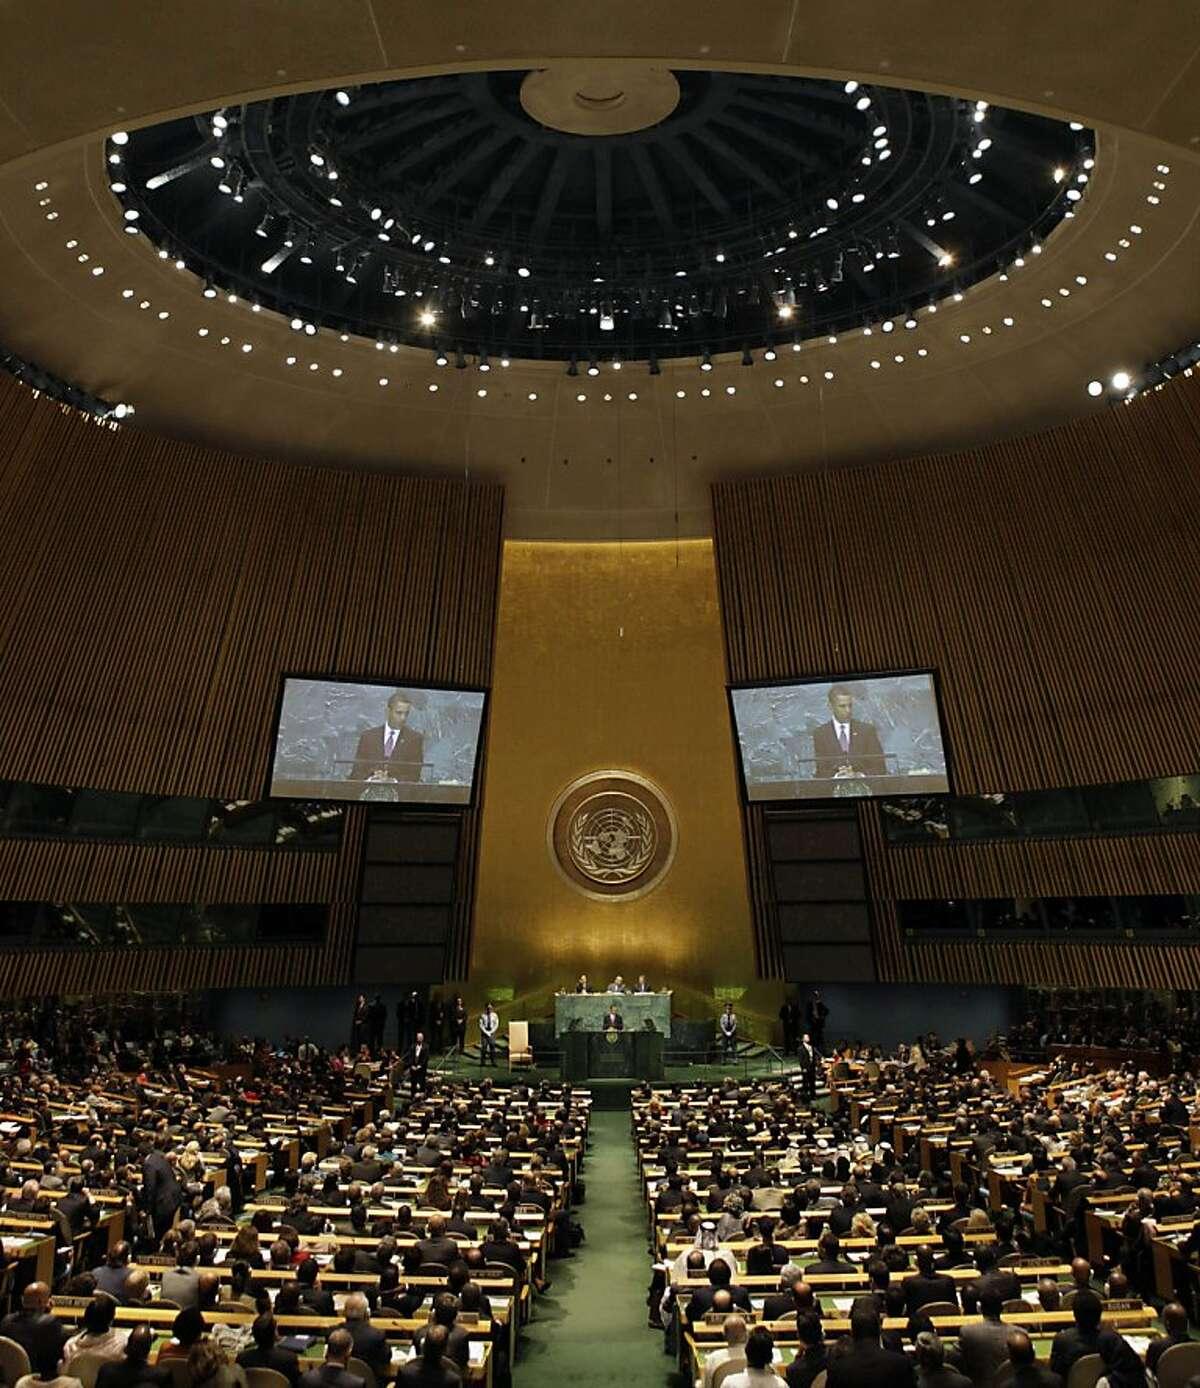 U.S. President Barack Obama addresses the 64th session of the United Nations General Assembly, Wednesday, Sept. 23, 2009. (AP Photo/Richard Drew)